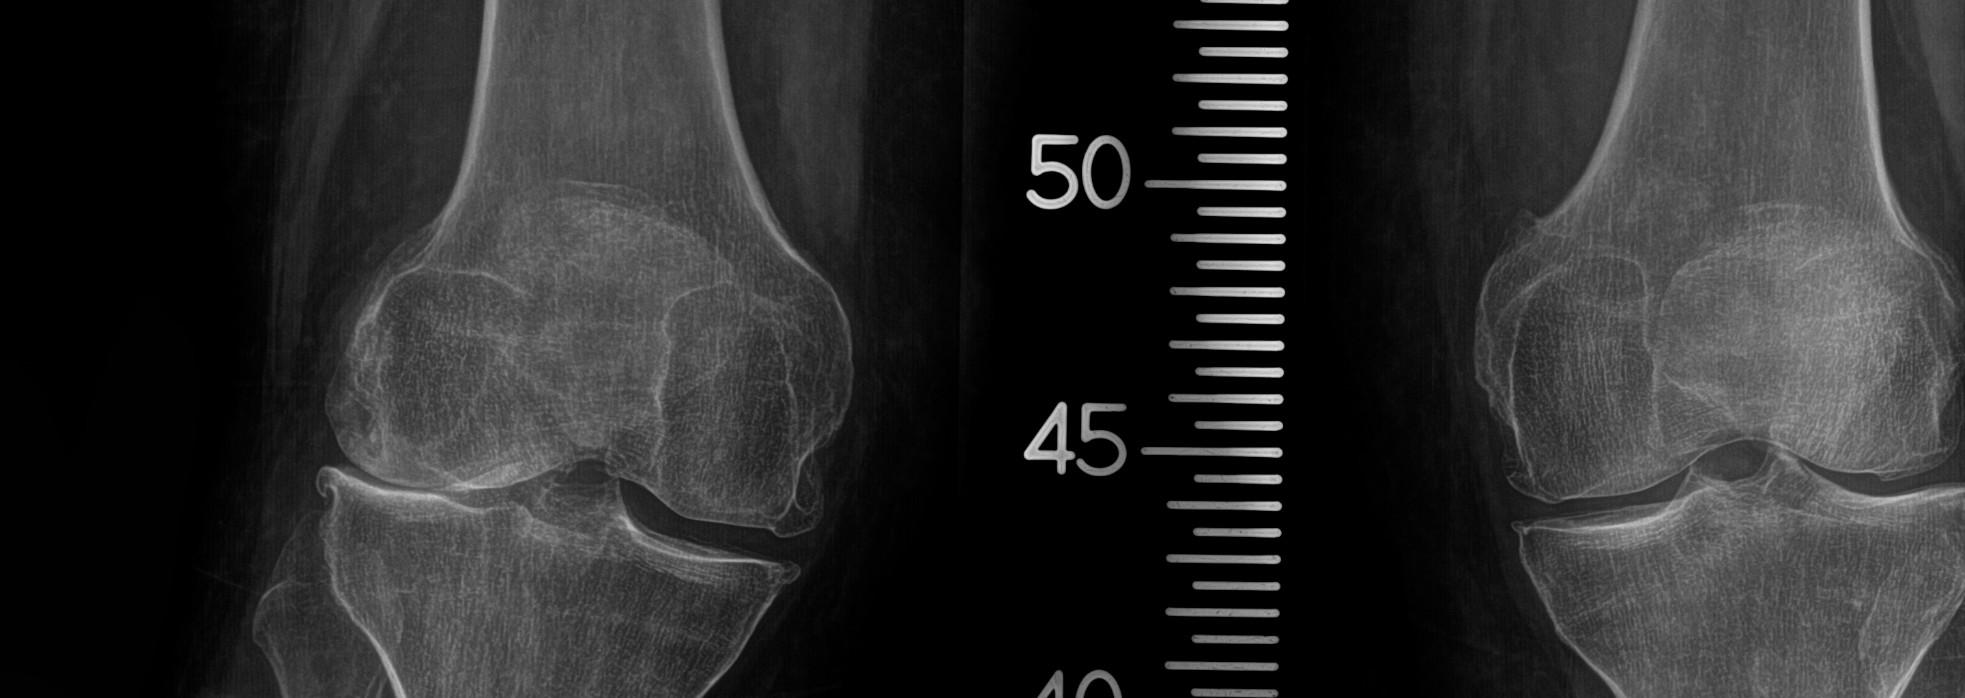 x-rays of knee osteonecrosis